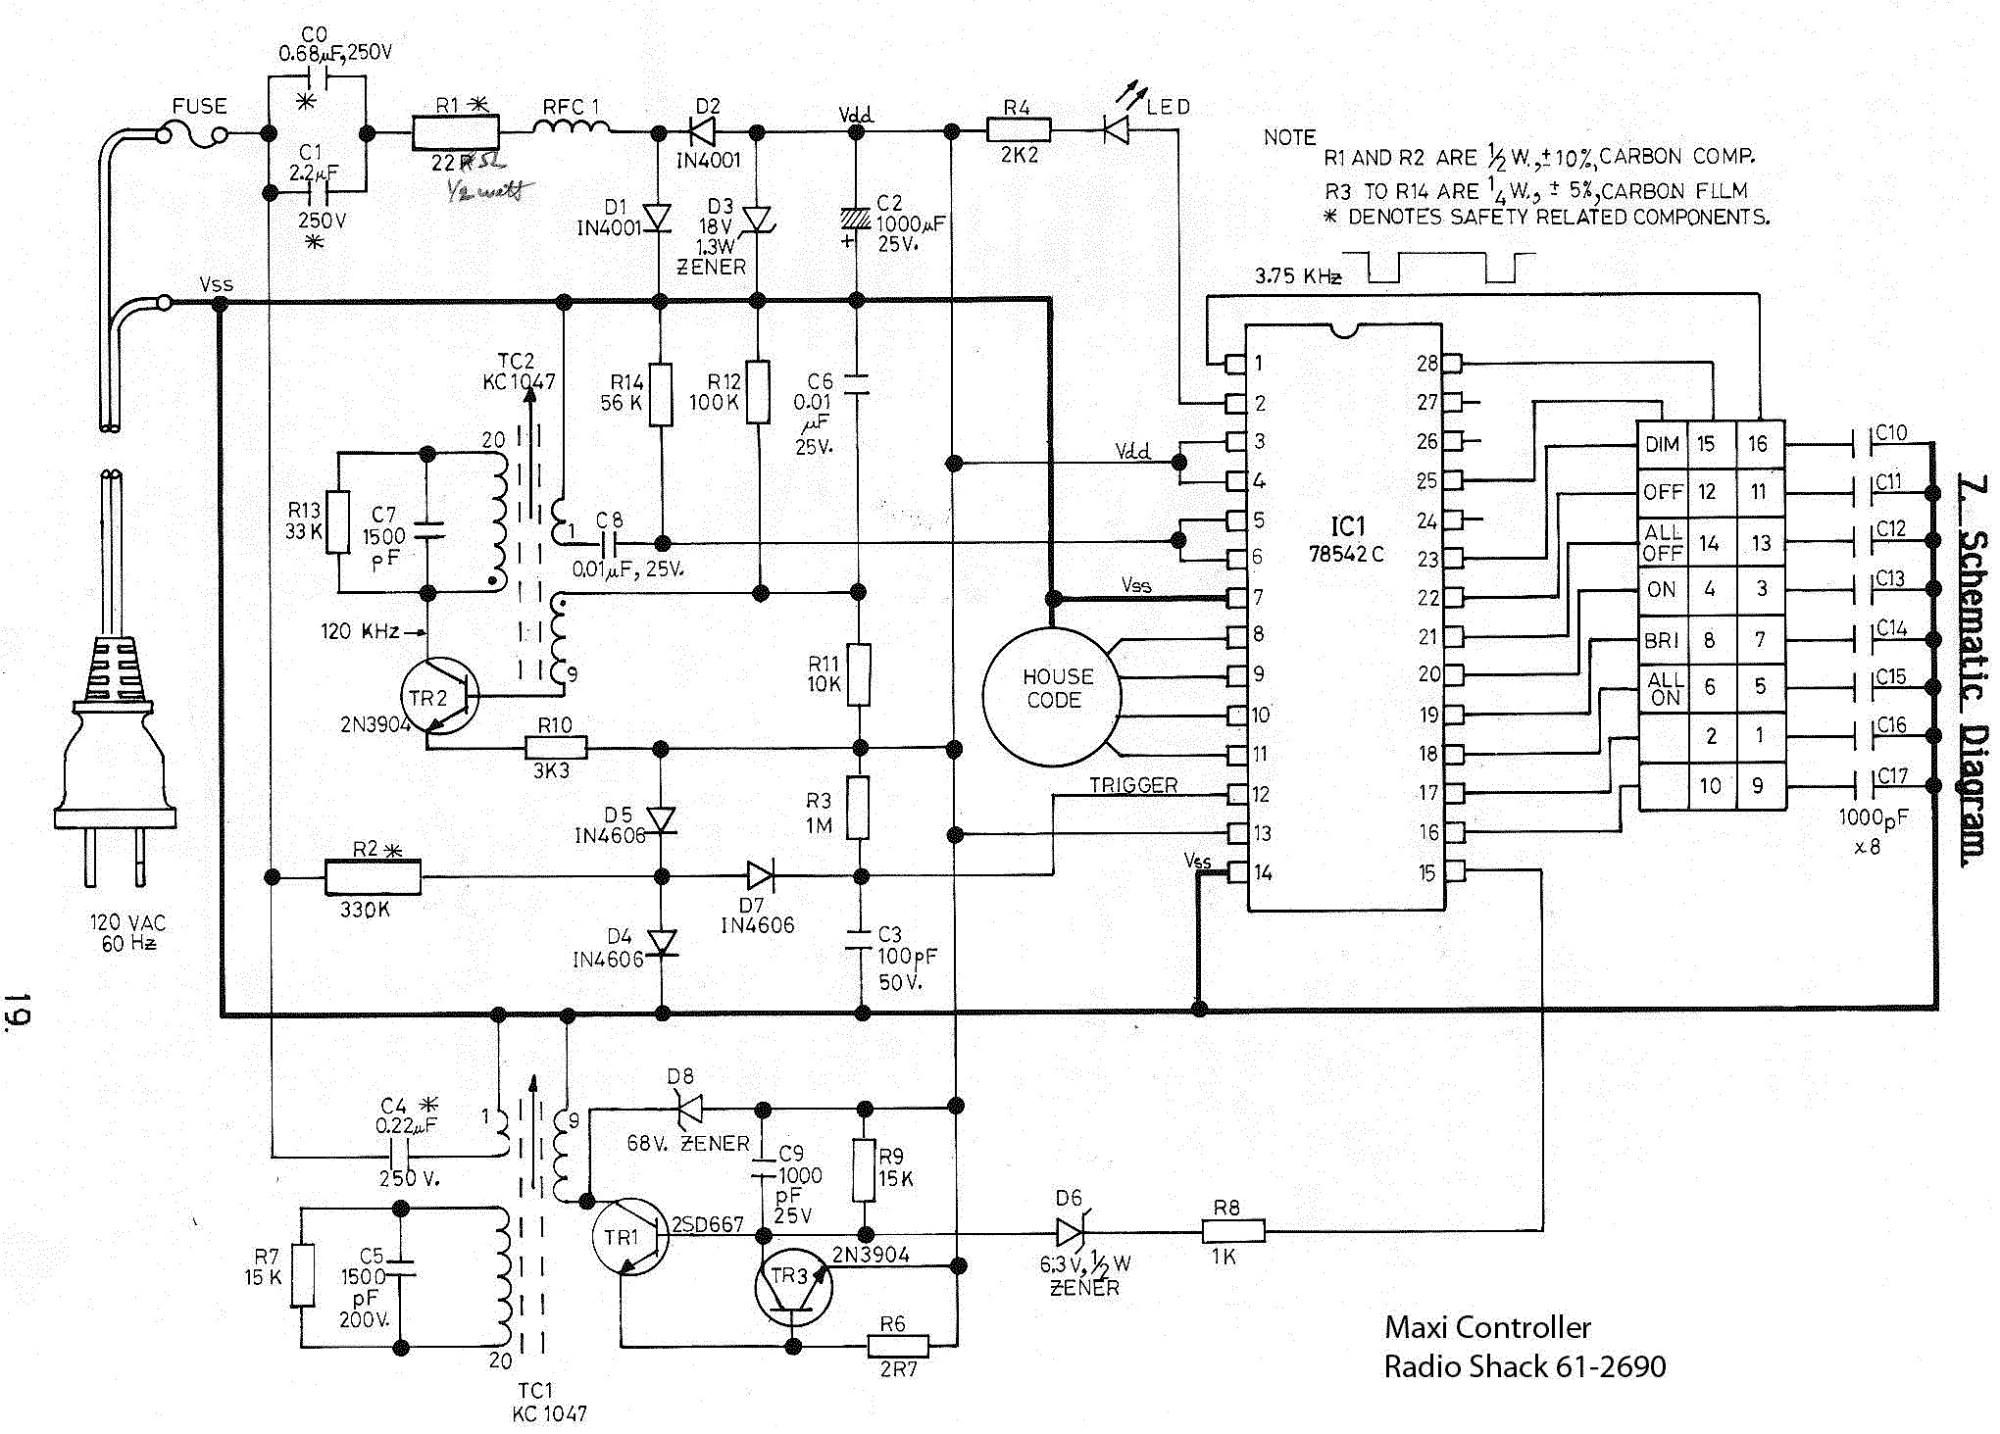 hight resolution of ups maintenance bypass switch wiring diagram wiring diagram for ups bypass switch fresh fine ups